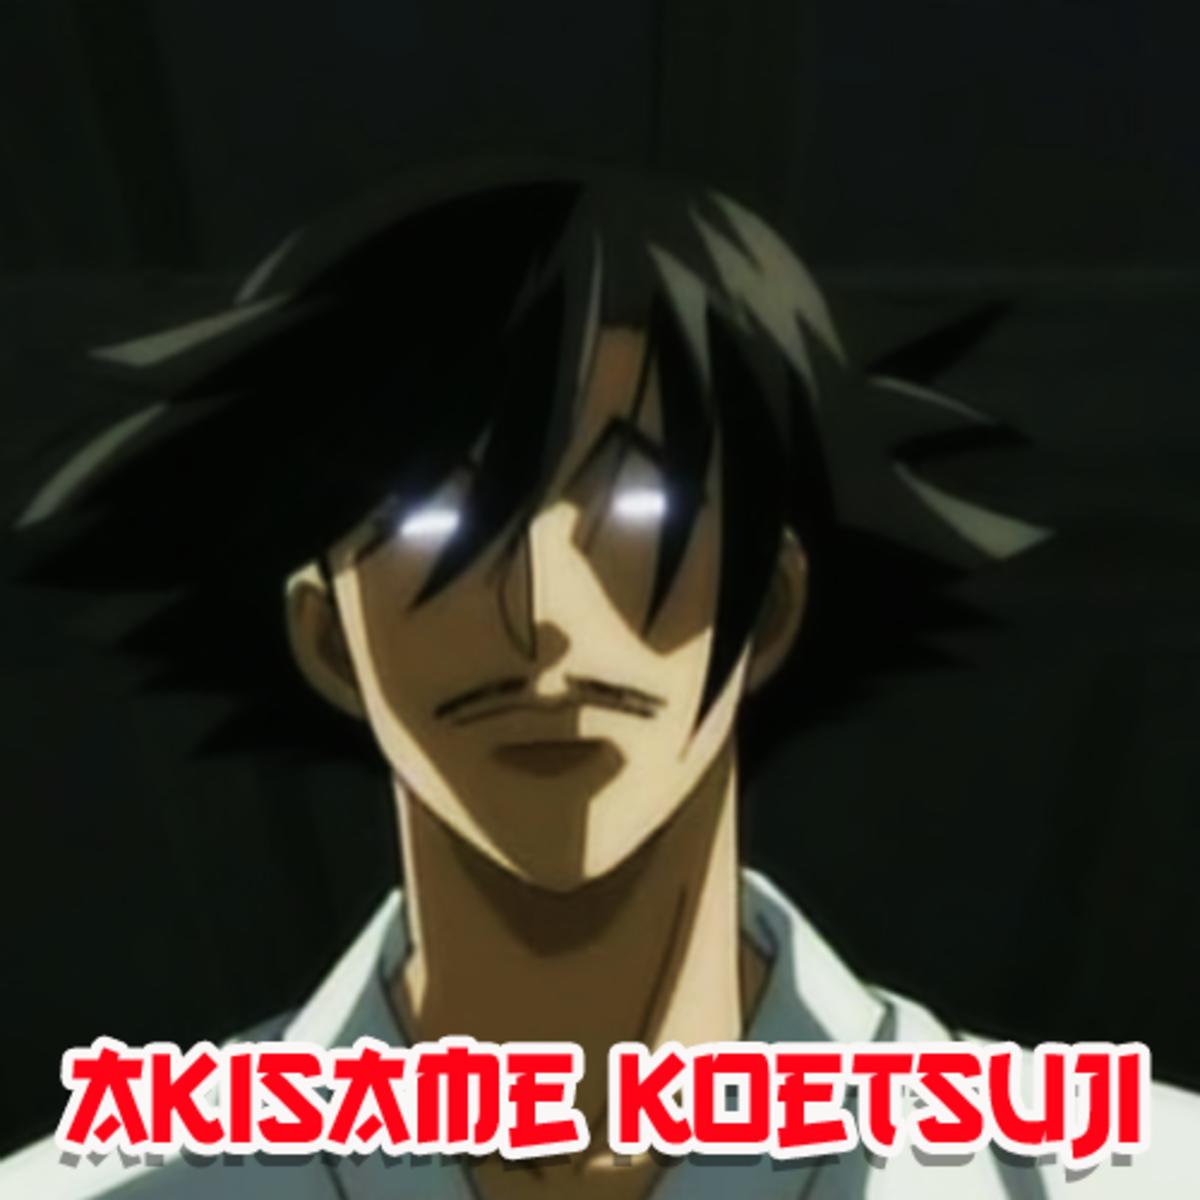 Akisame Koetsuji